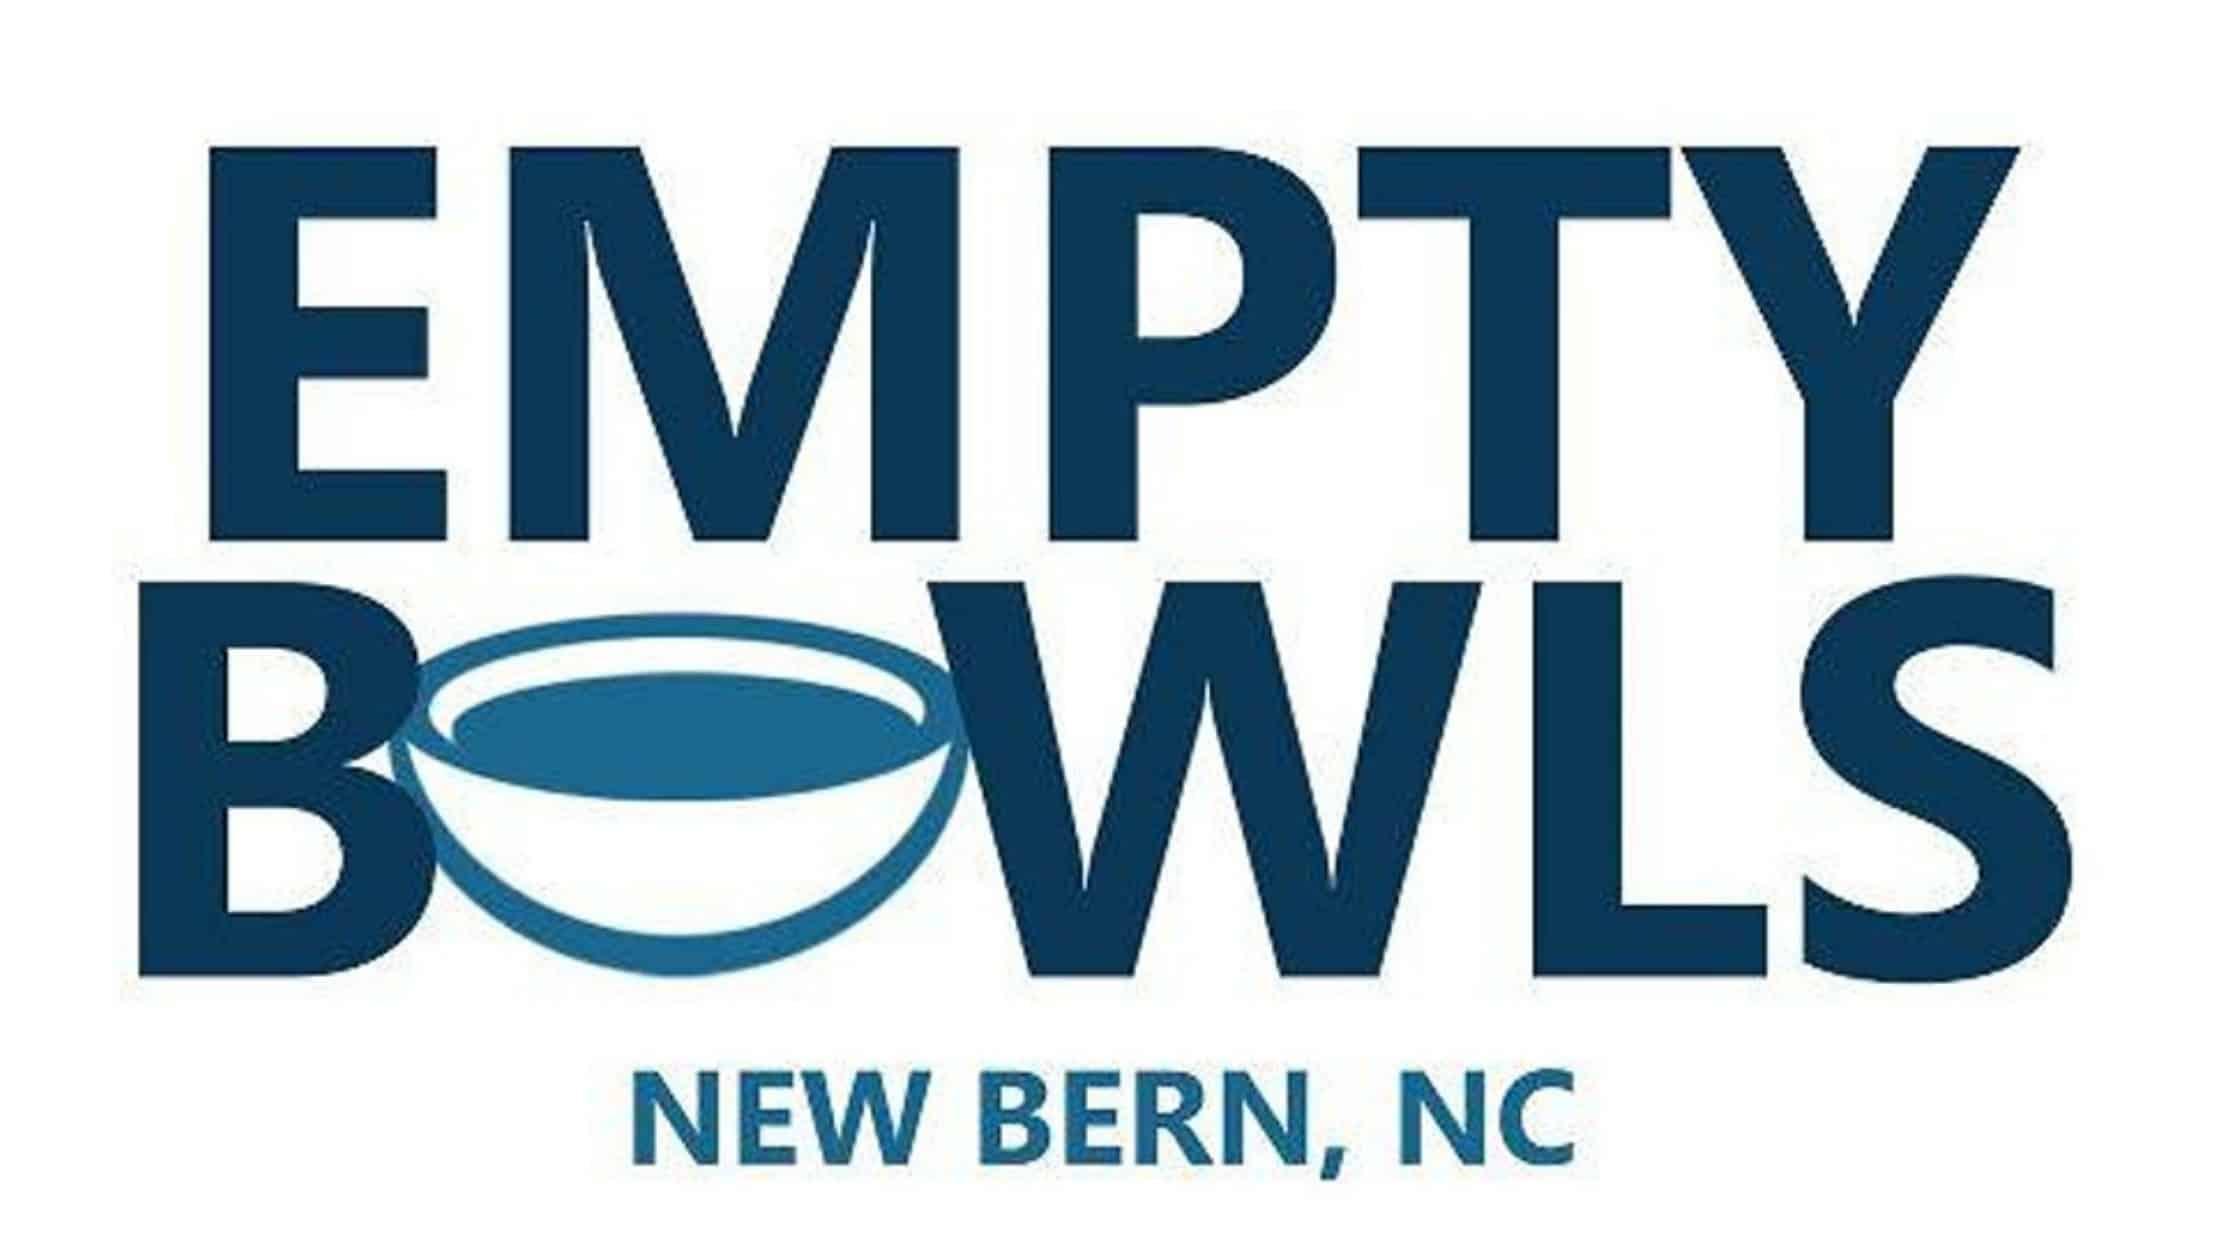 Empty Bowls New Bern NC